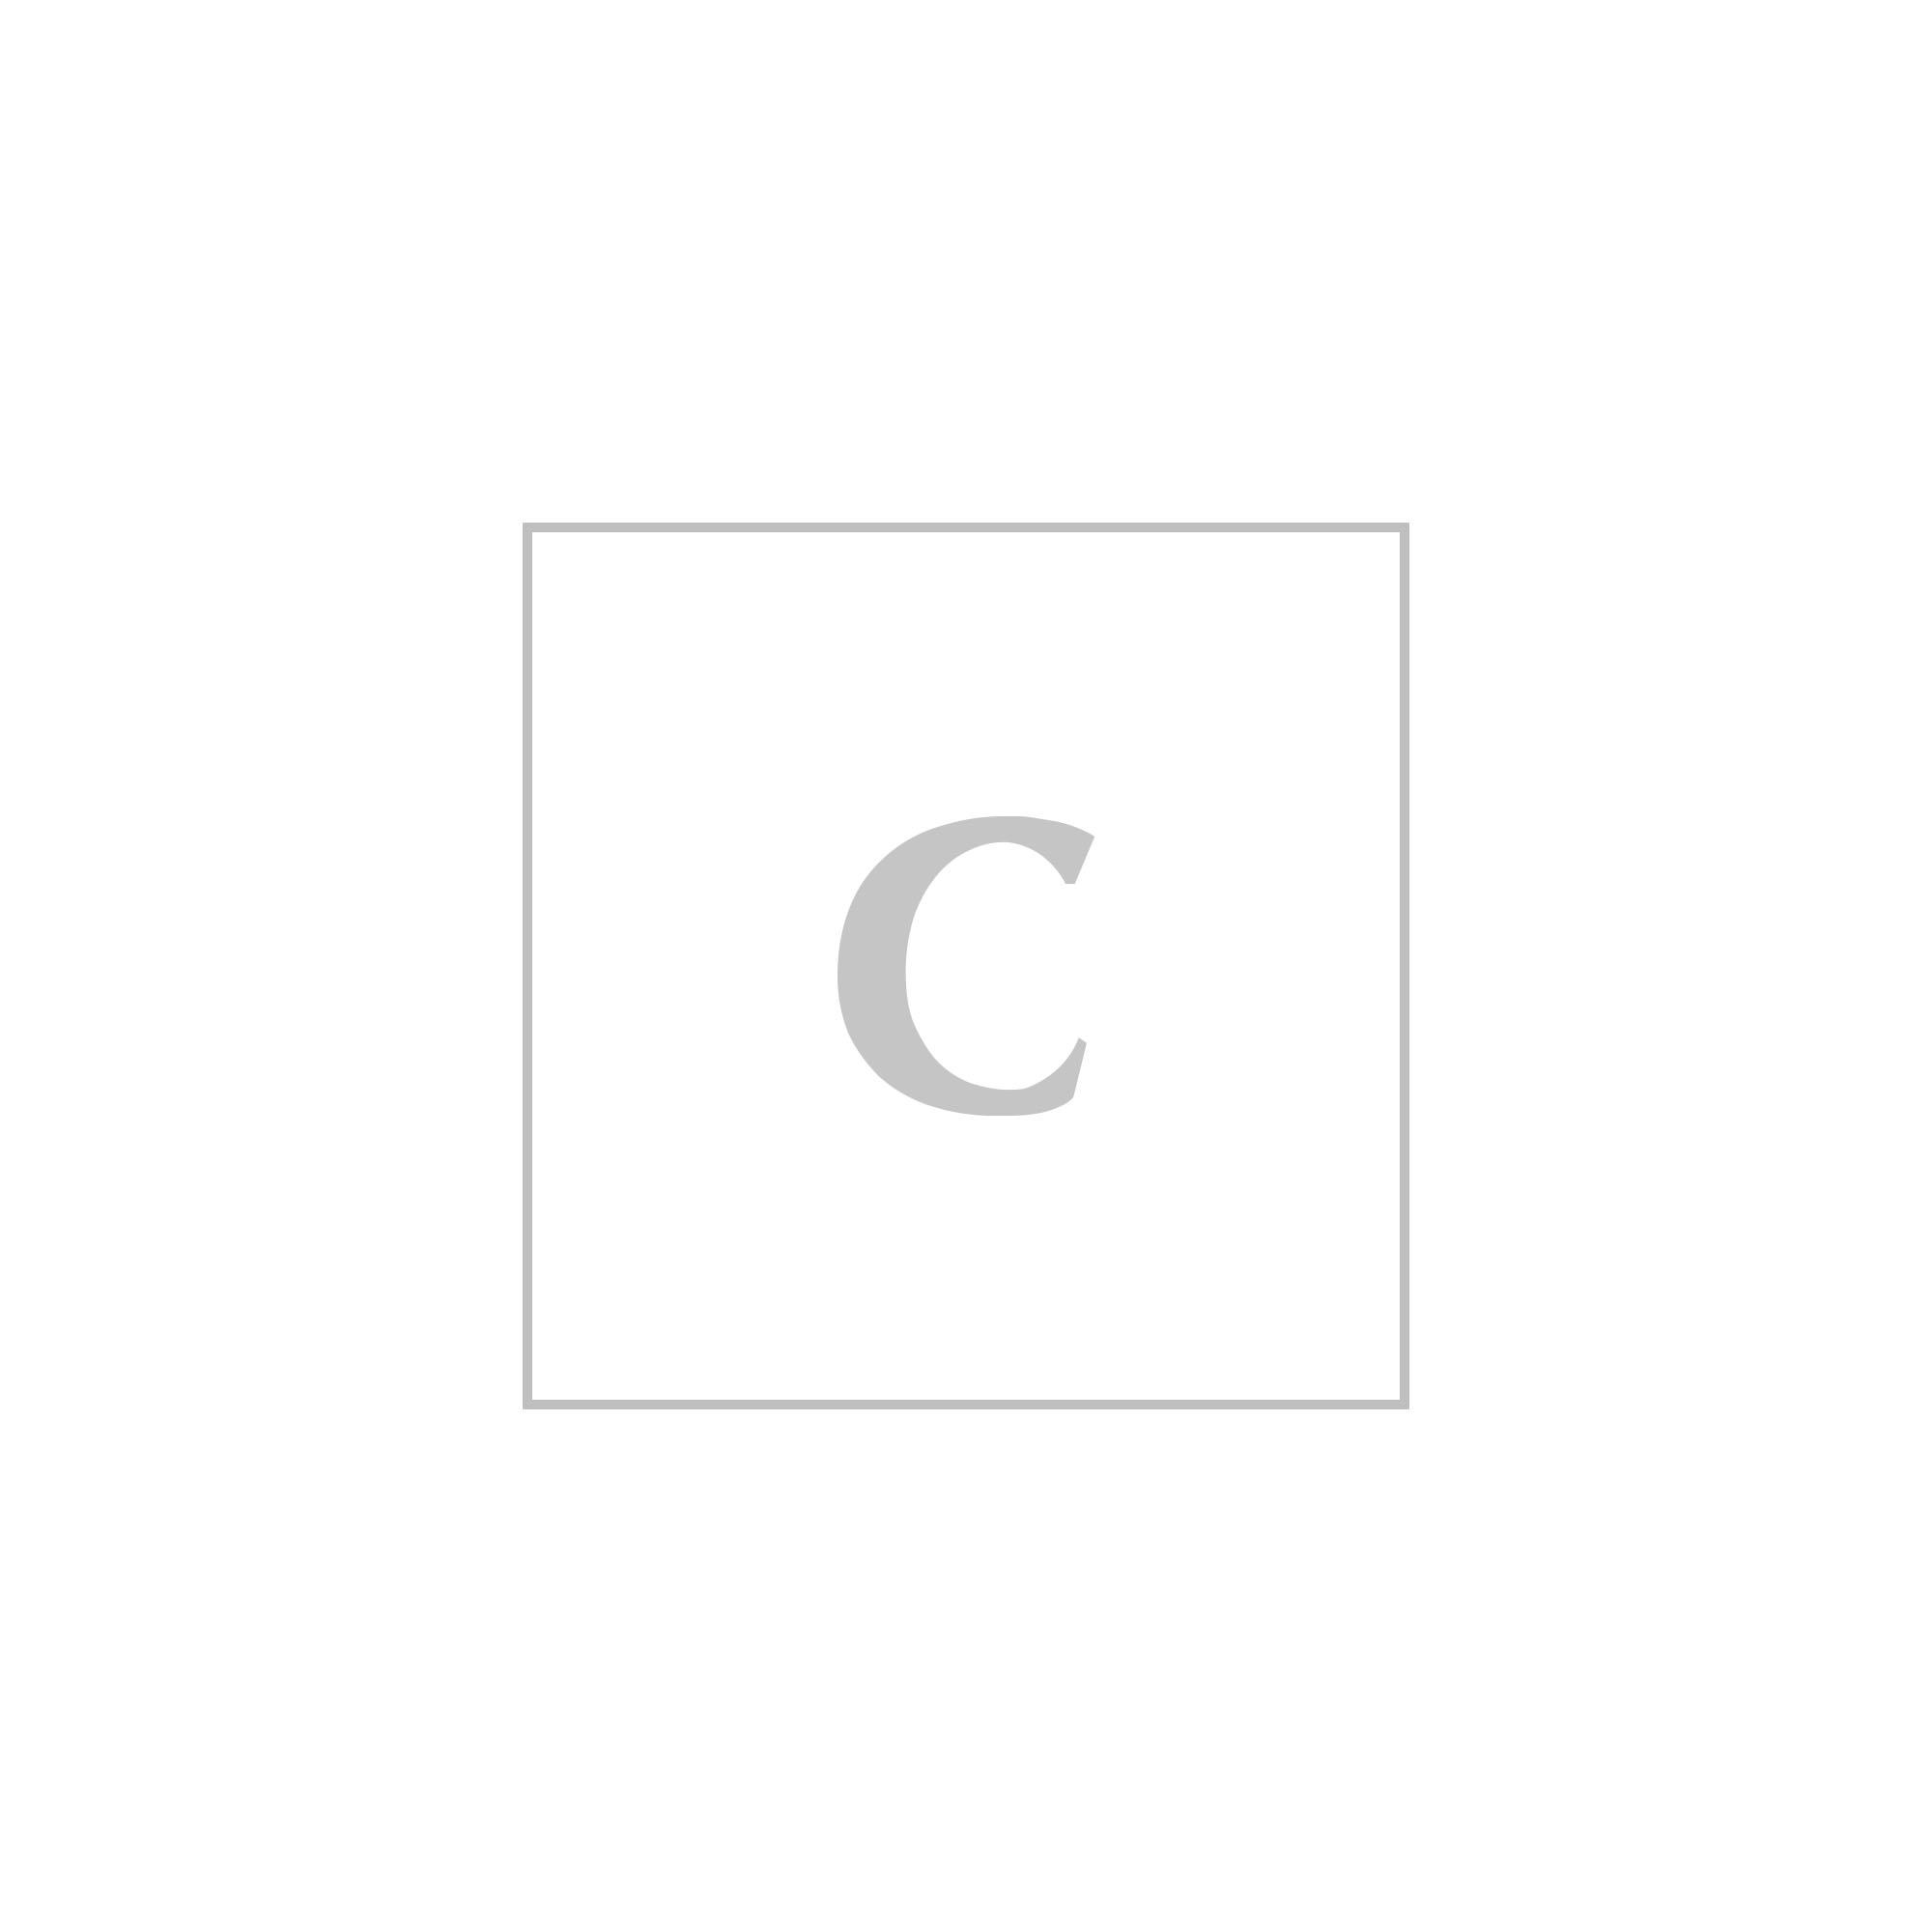 Burberry sandon cardholder